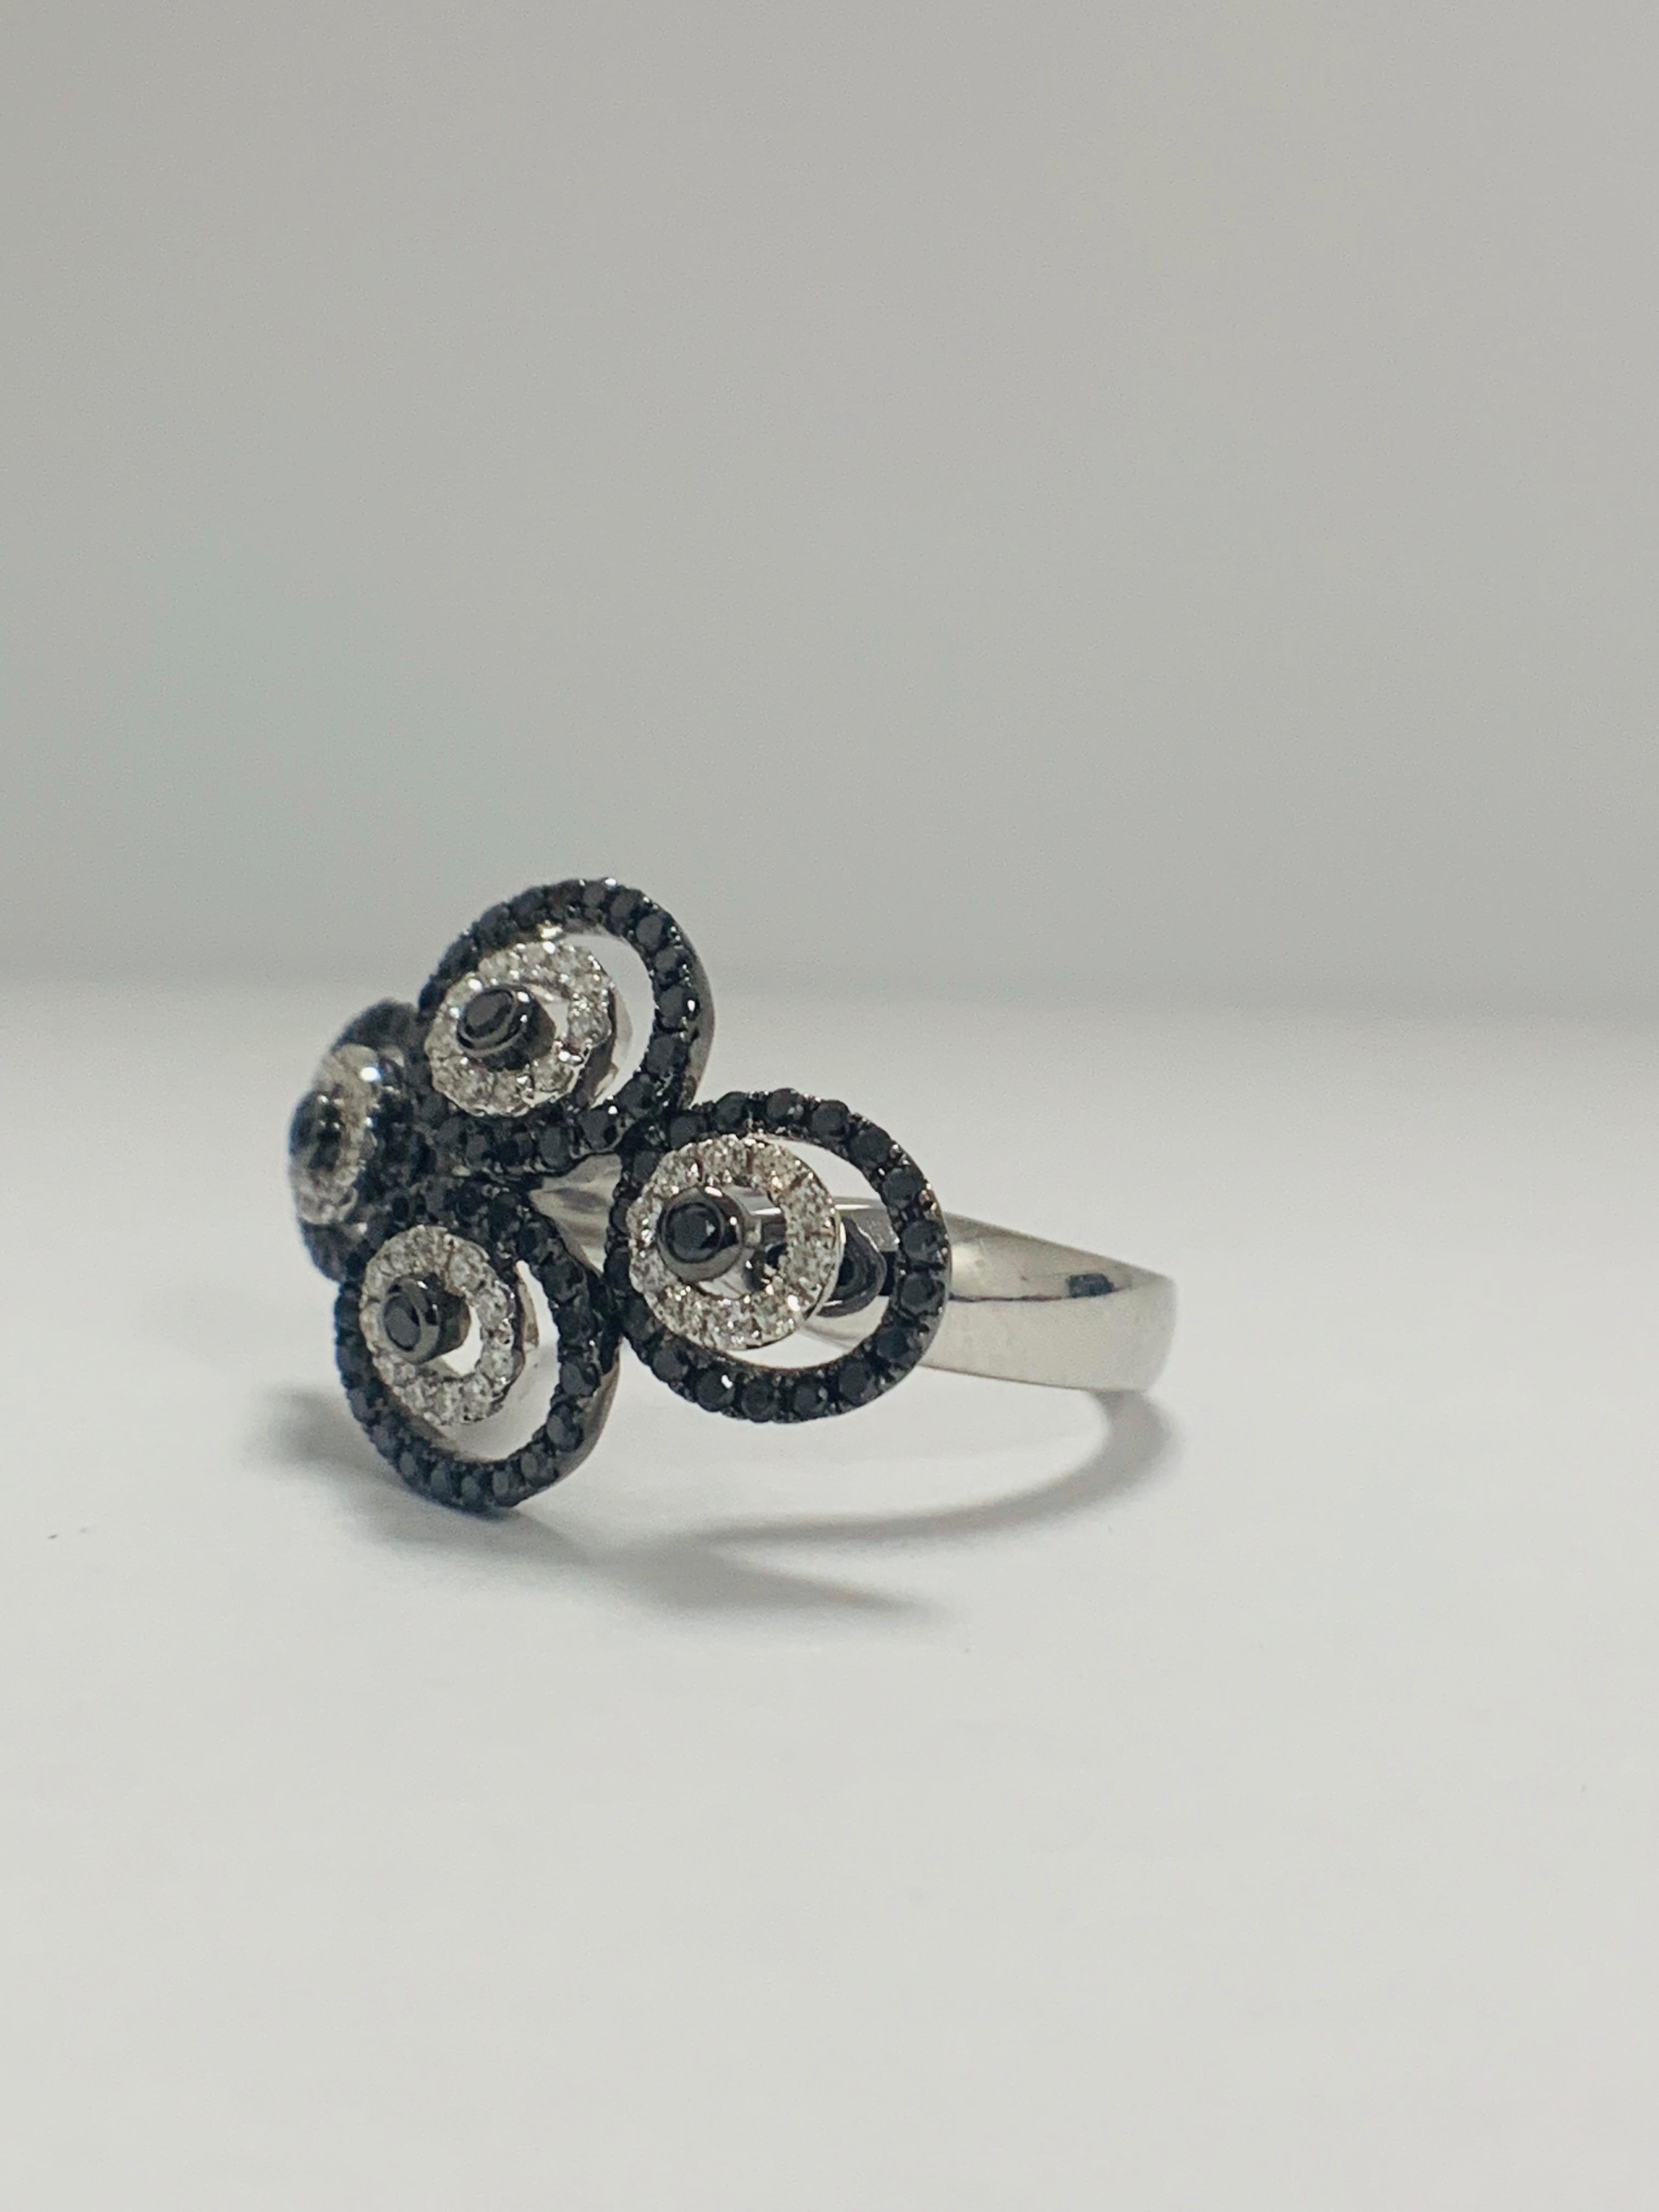 18ct White Gold Diamond ring featuring 80 round cut, black Diamonds (0.61ct TBDW) - Image 2 of 12